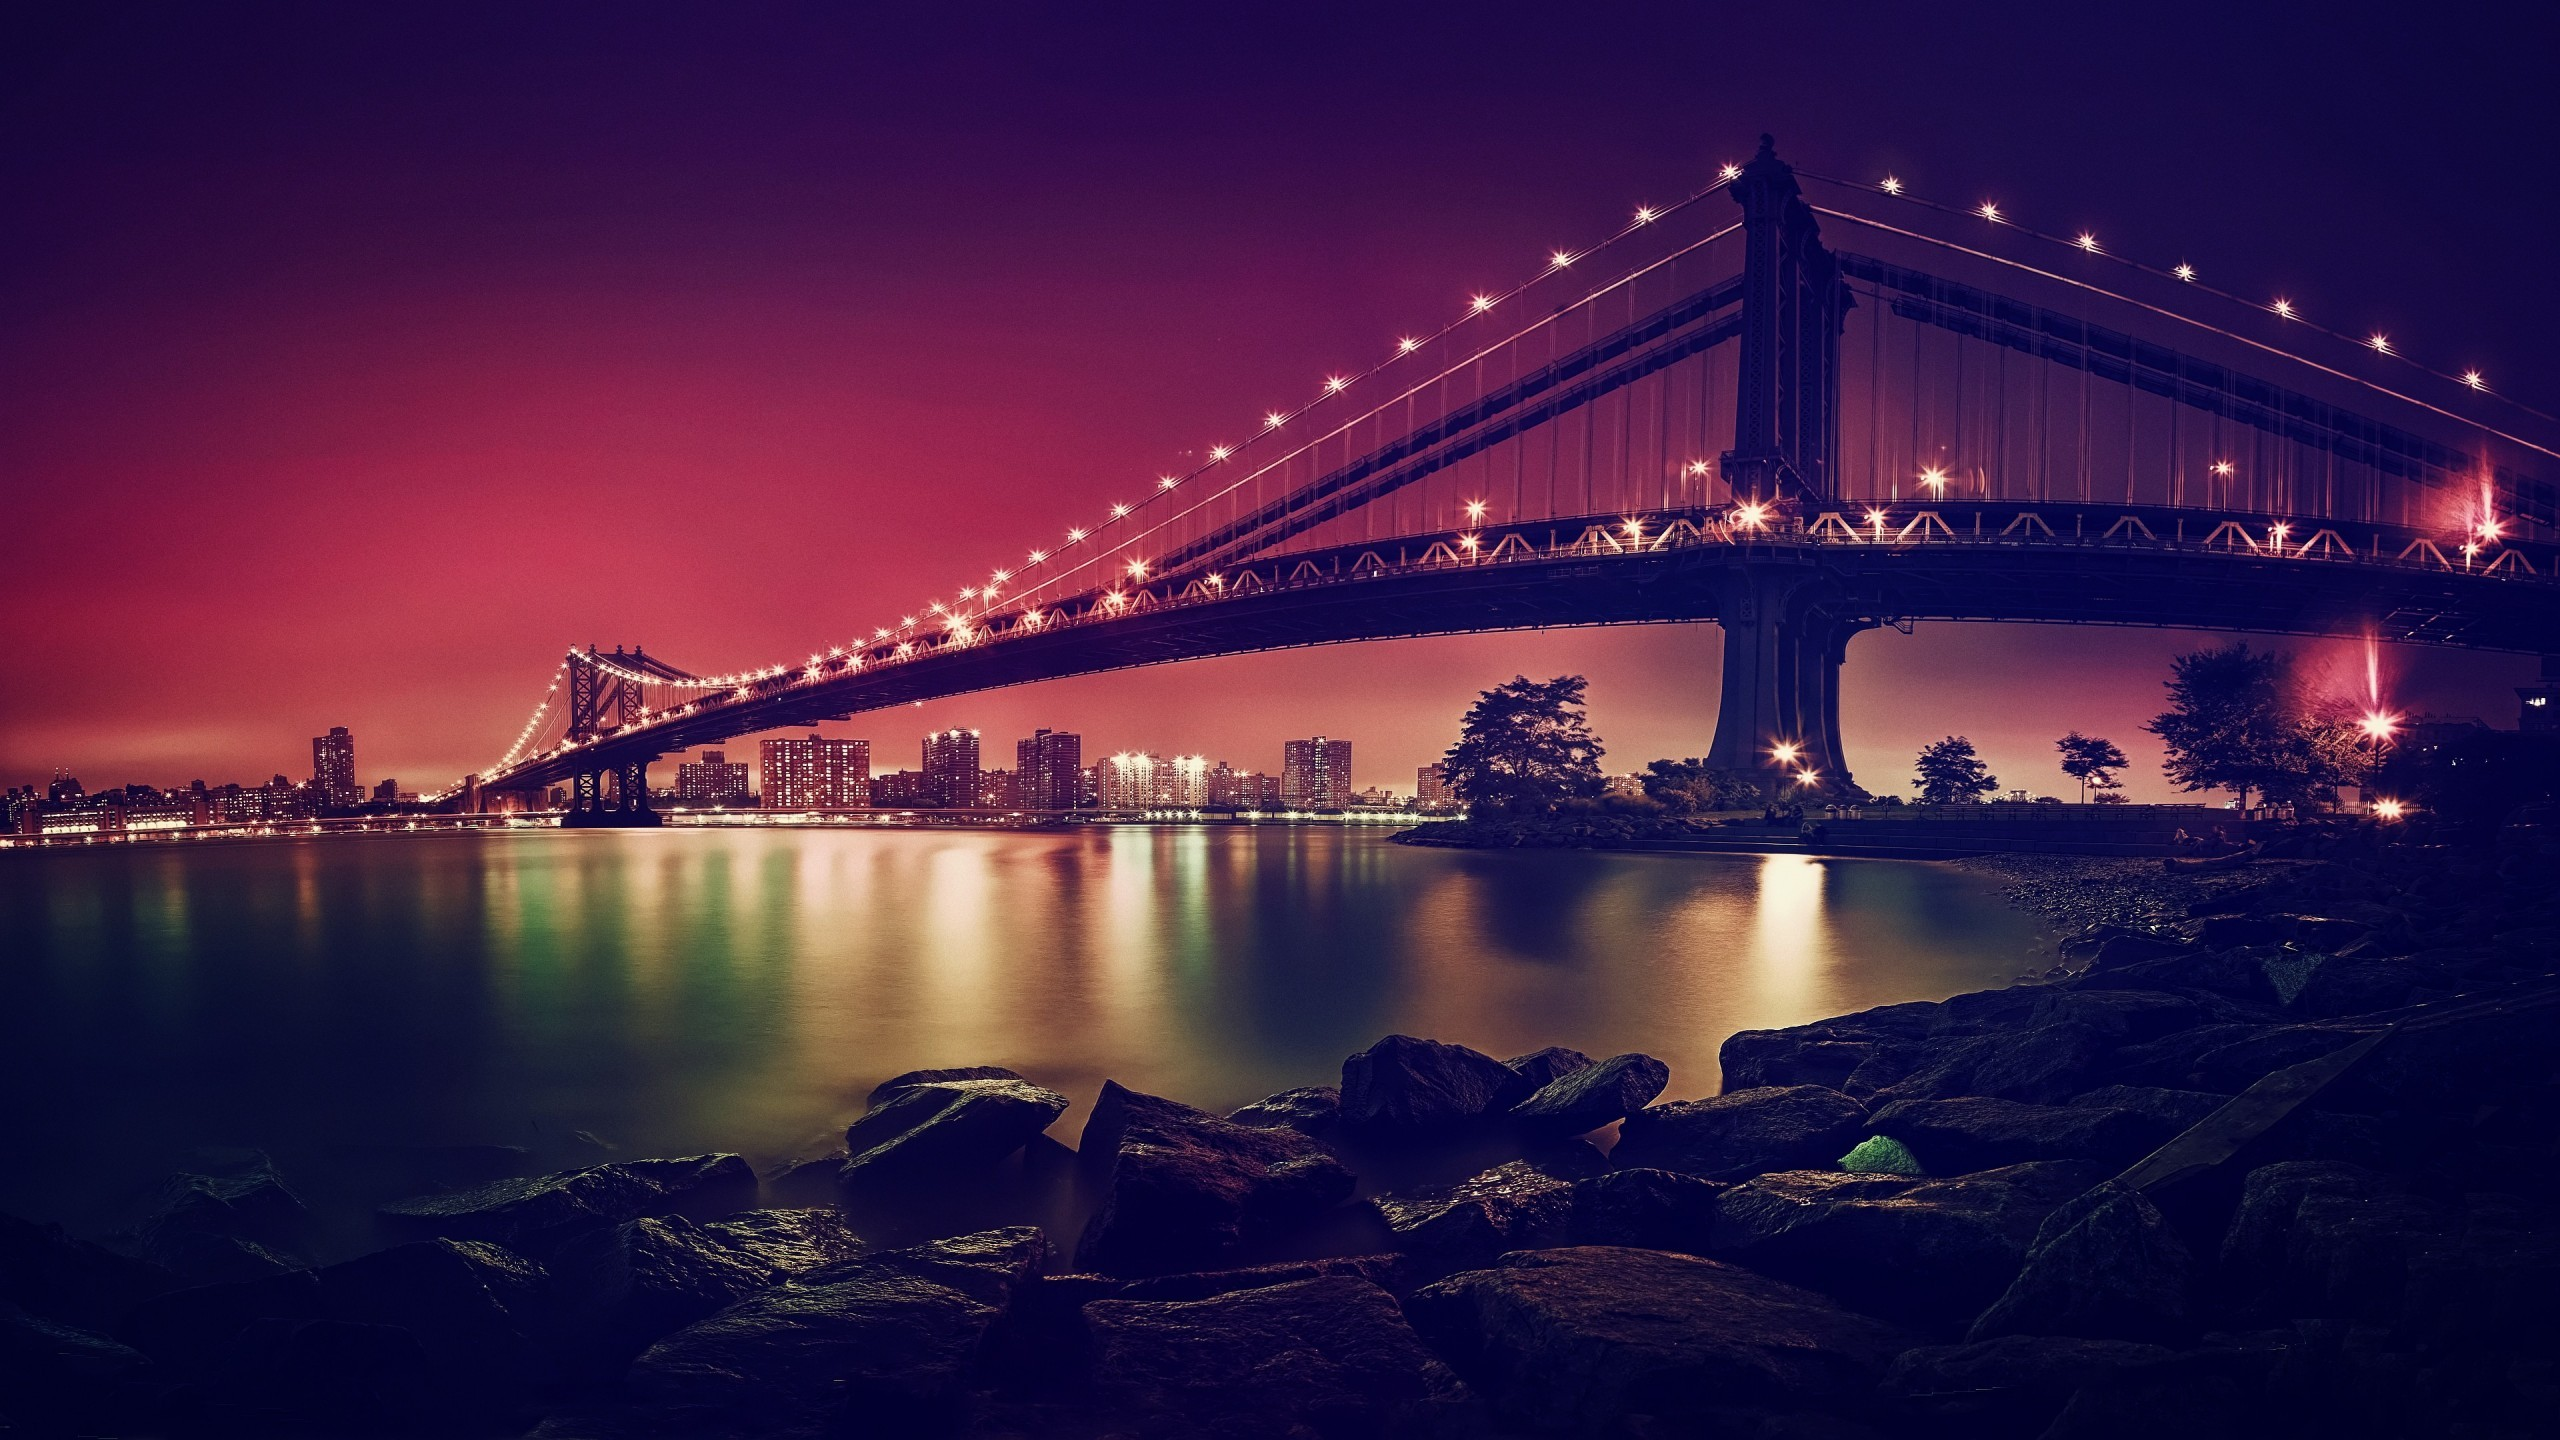 Tags: Manhattan Bridge, Suspension bridge, New York City, 4K